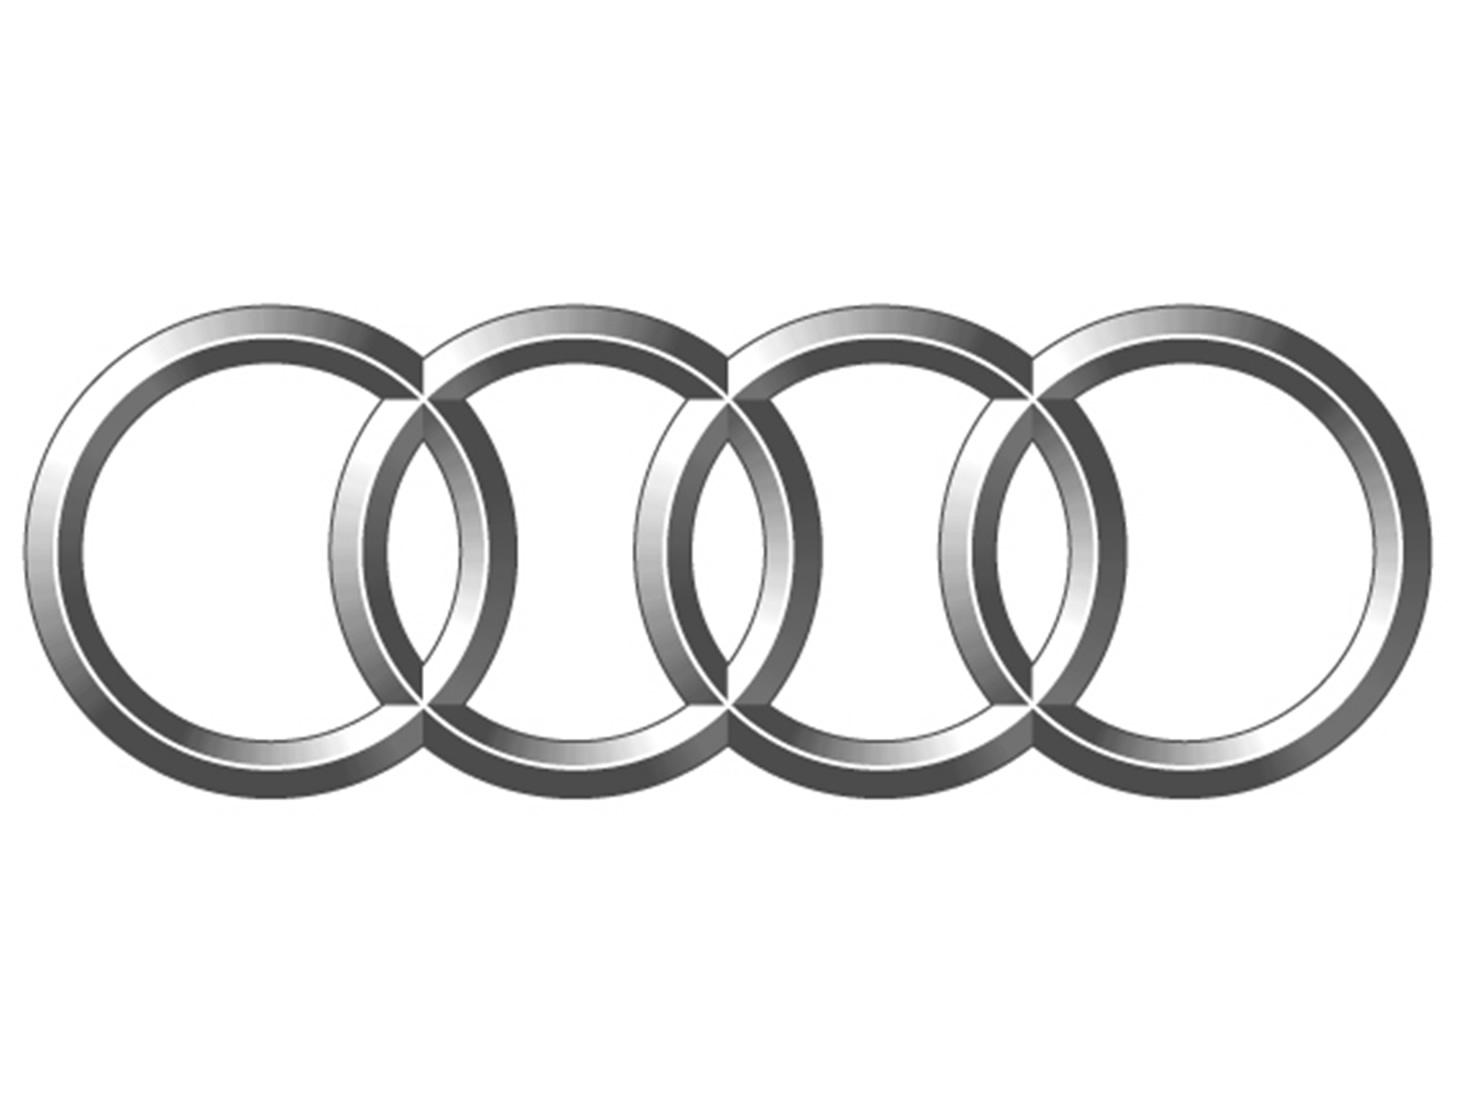 Four Ring Car Company